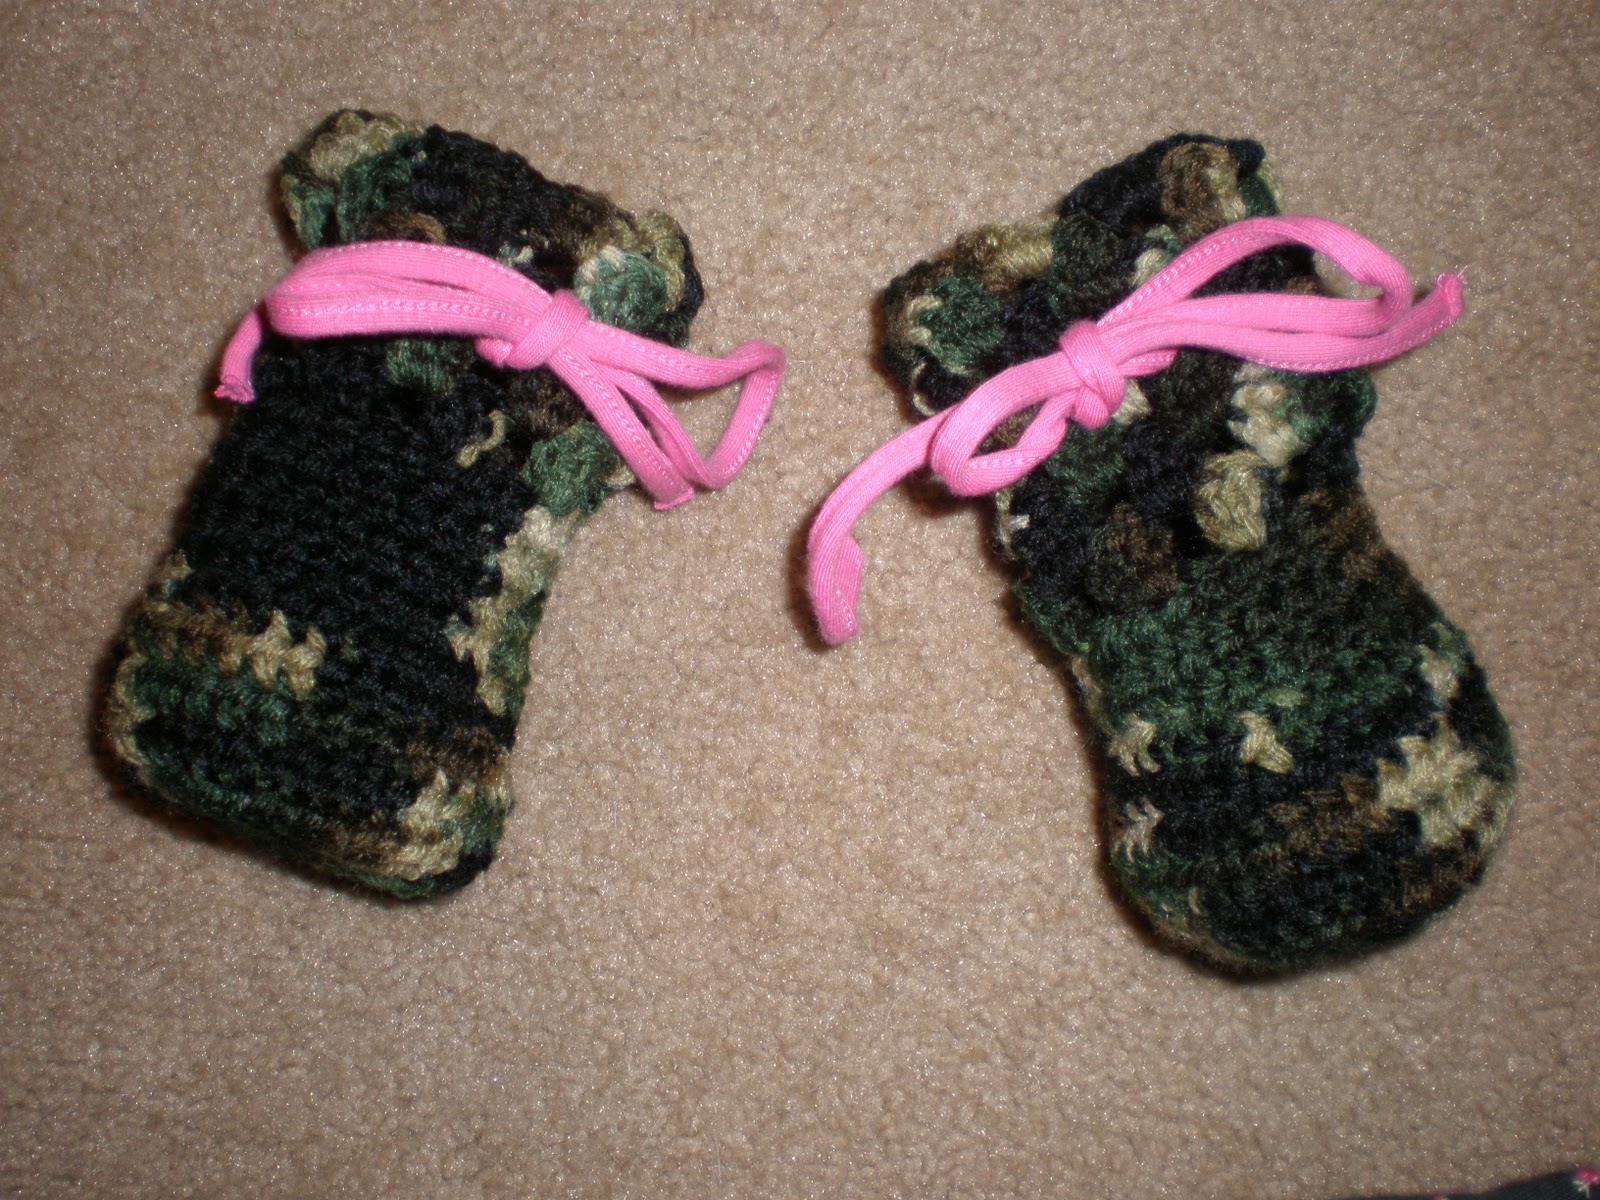 Amys Crochet: Camo Dog Boots